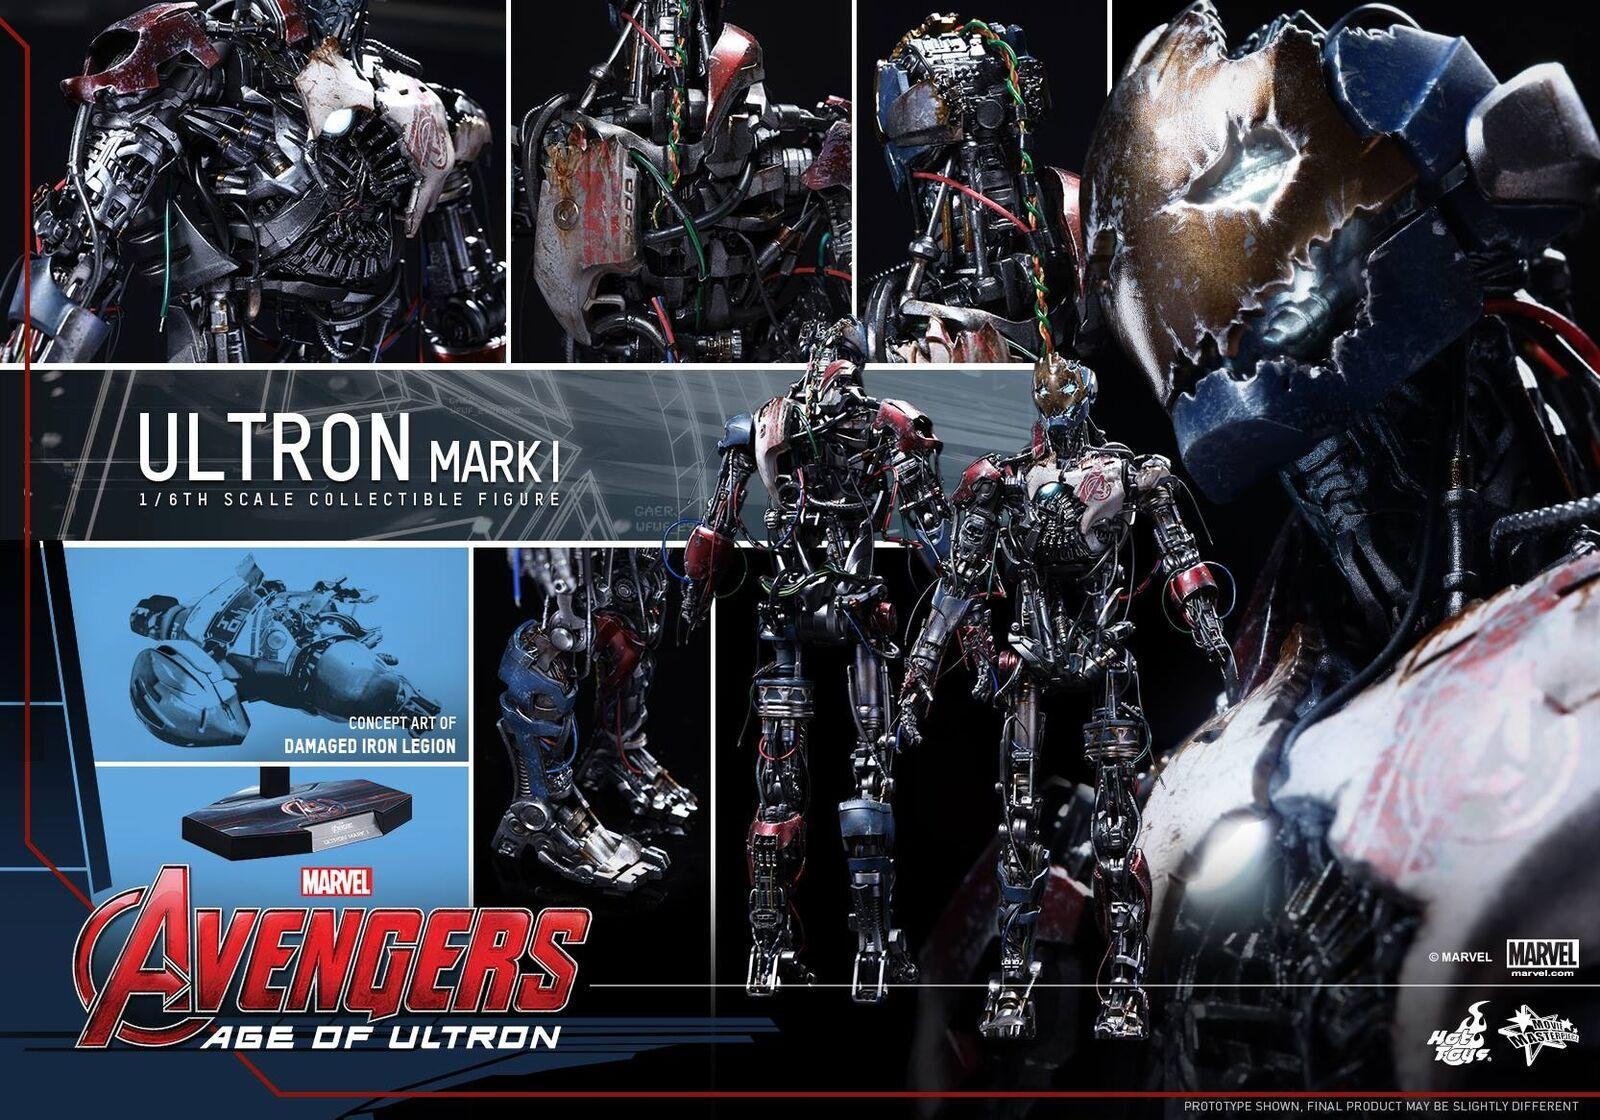 Hot Toys 1 6 Marvel Avengers mms292 Ultron mk1 Mark I Masterpiece Action Figure